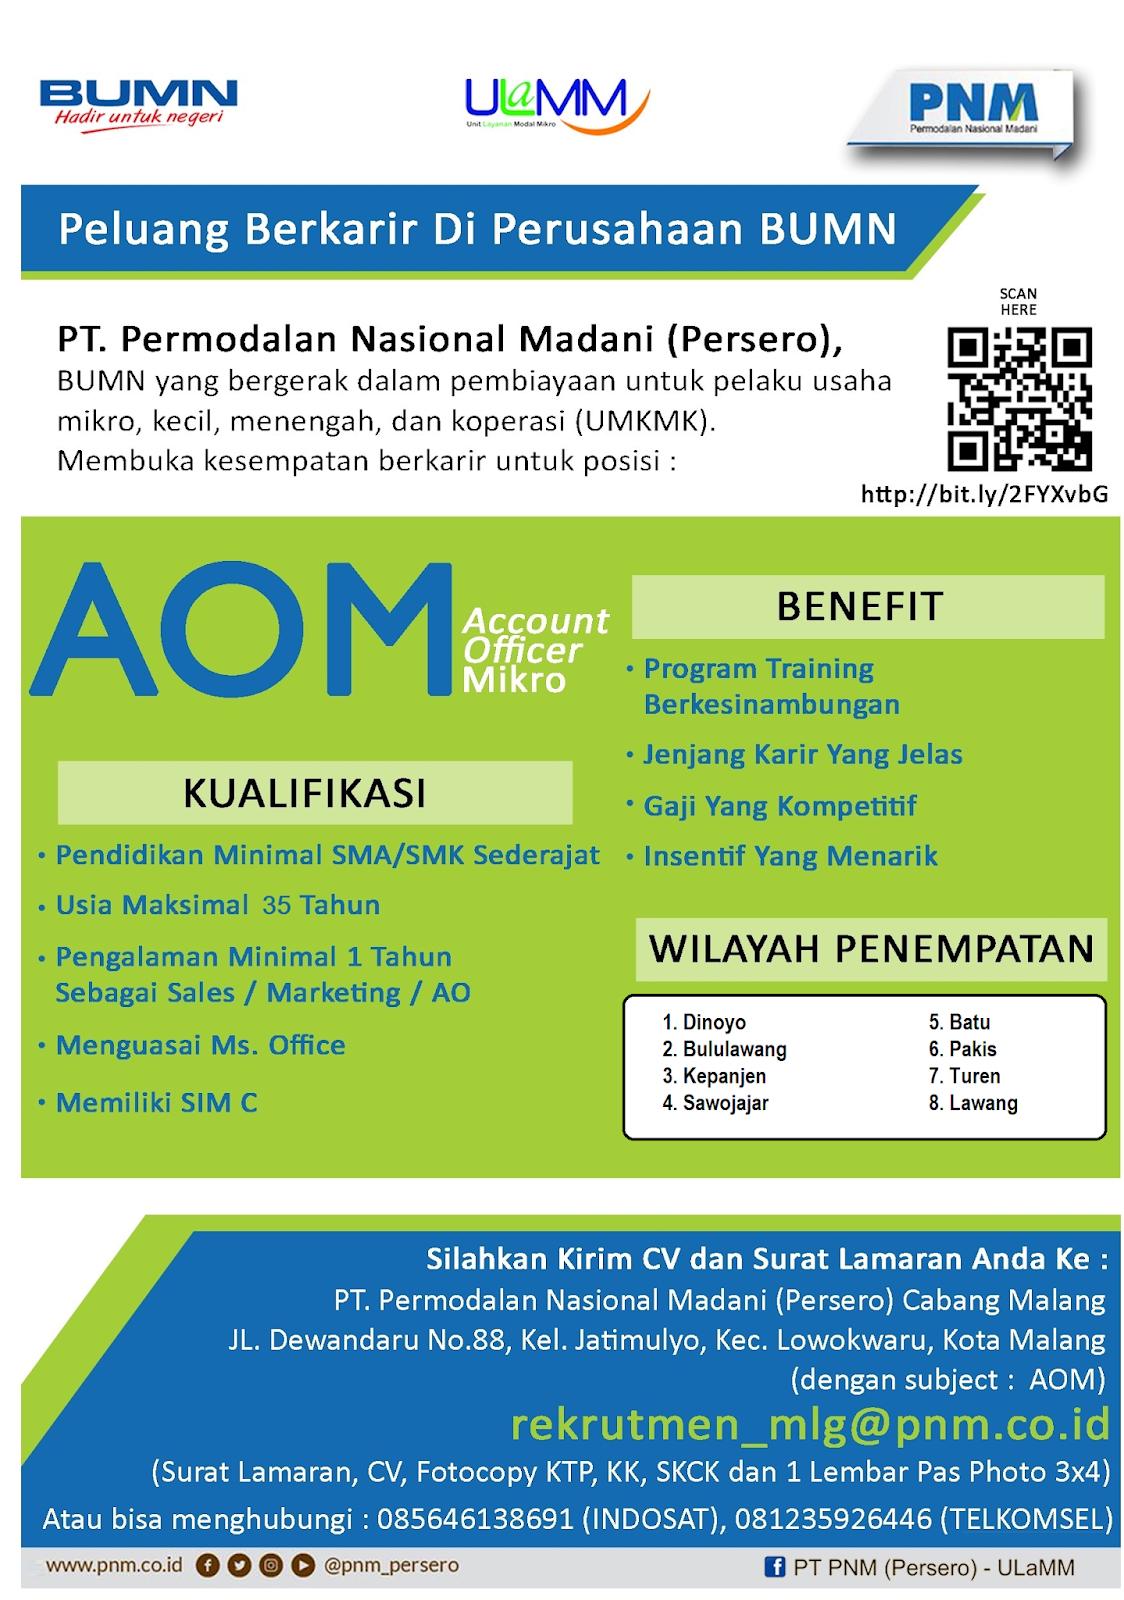 Lowongan Kerja Tingkat SMA PT Permodalan Nasional Madani (Persero)